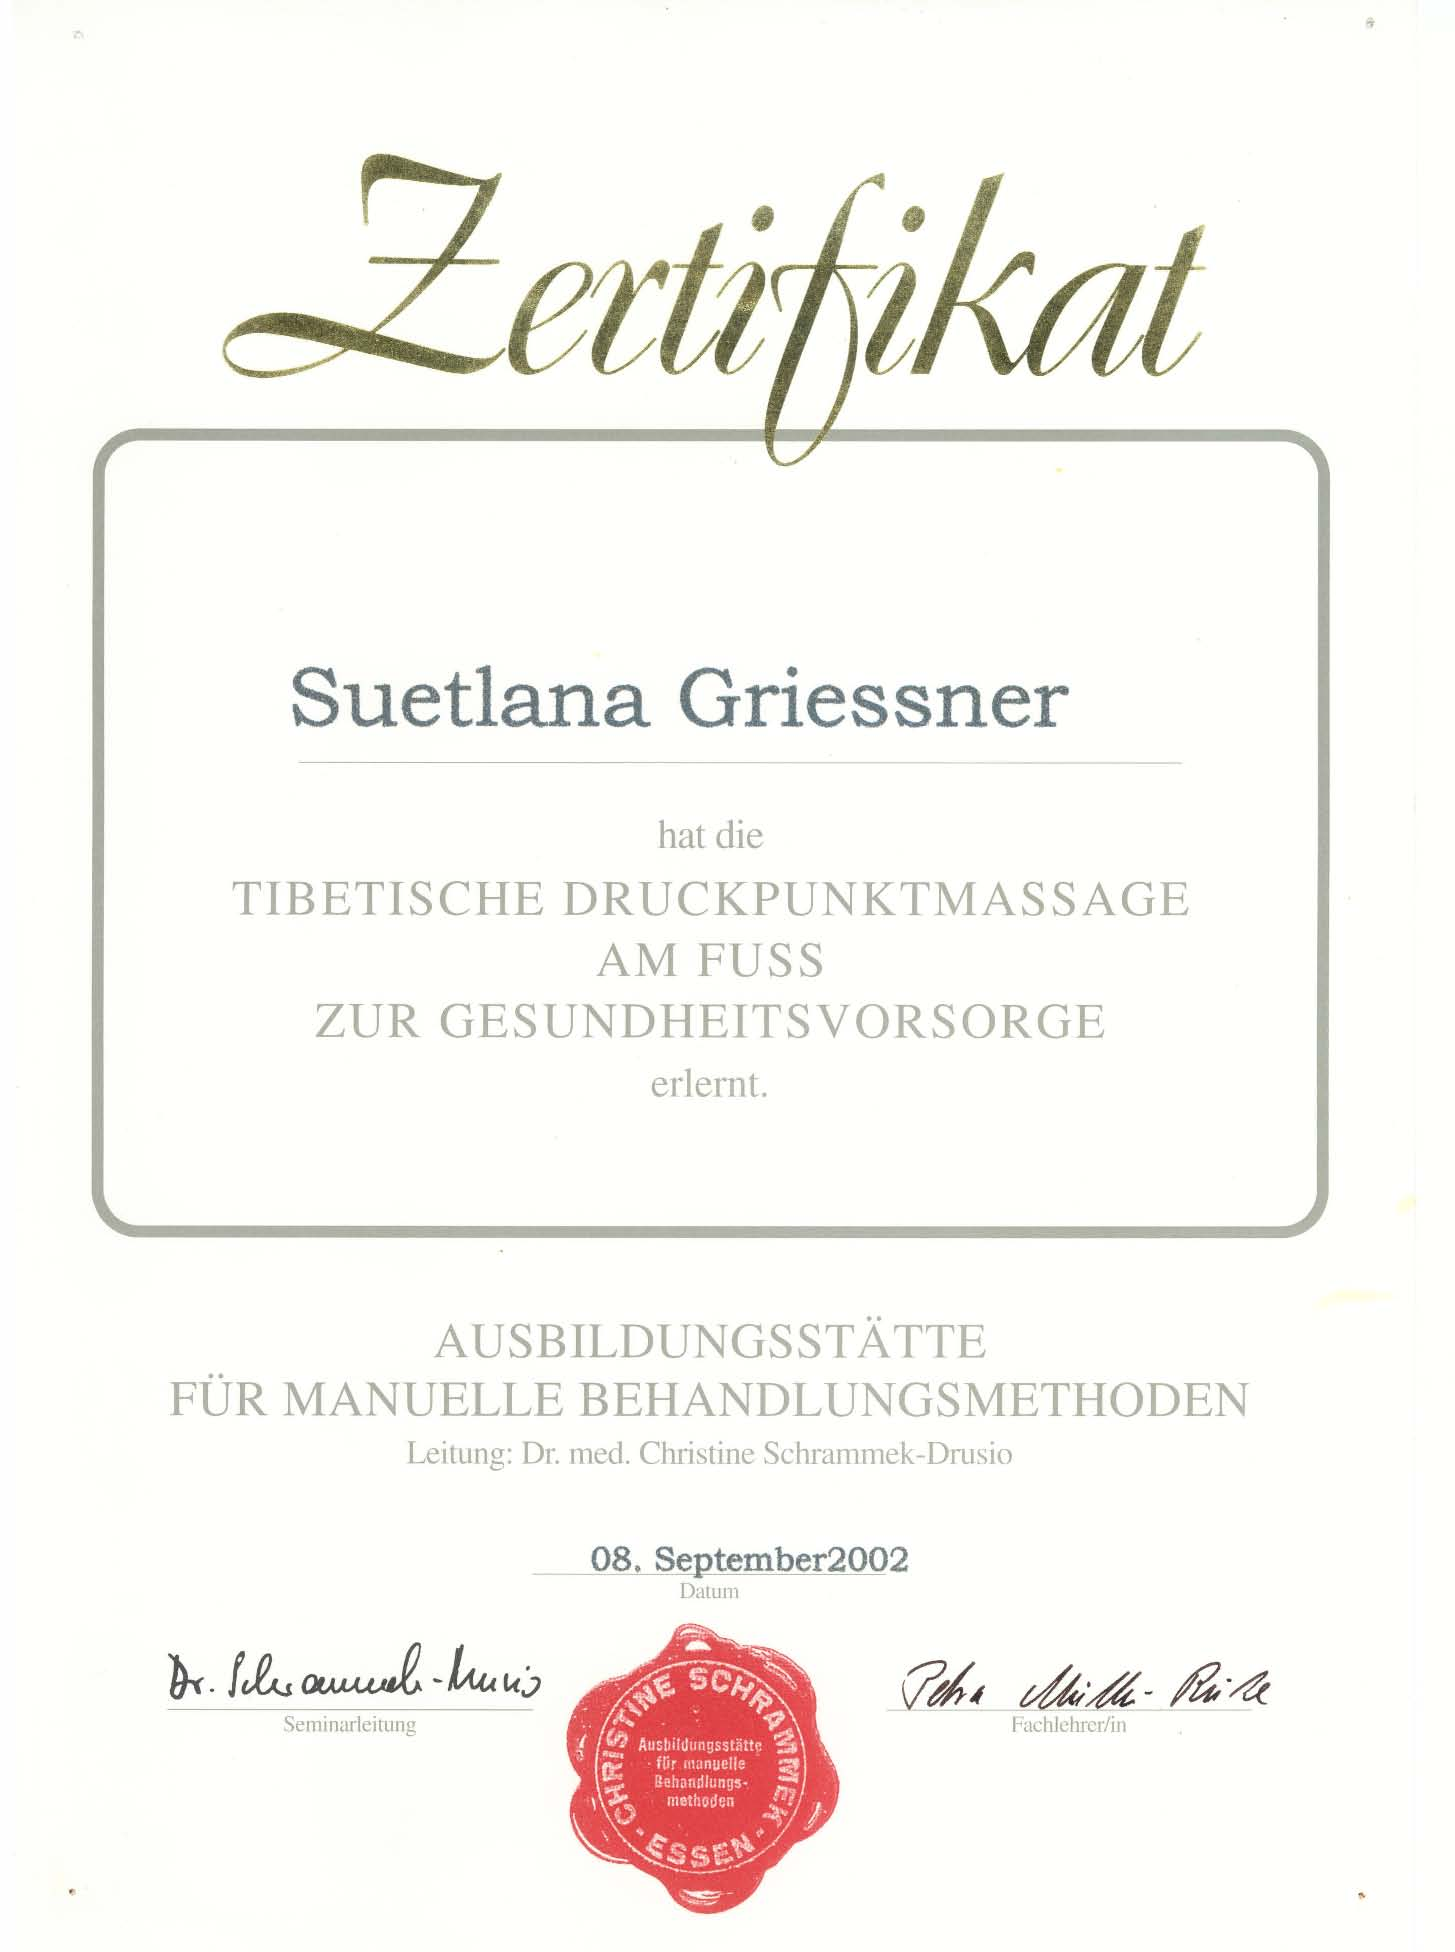 Zertifikat von Suetlana Griessner